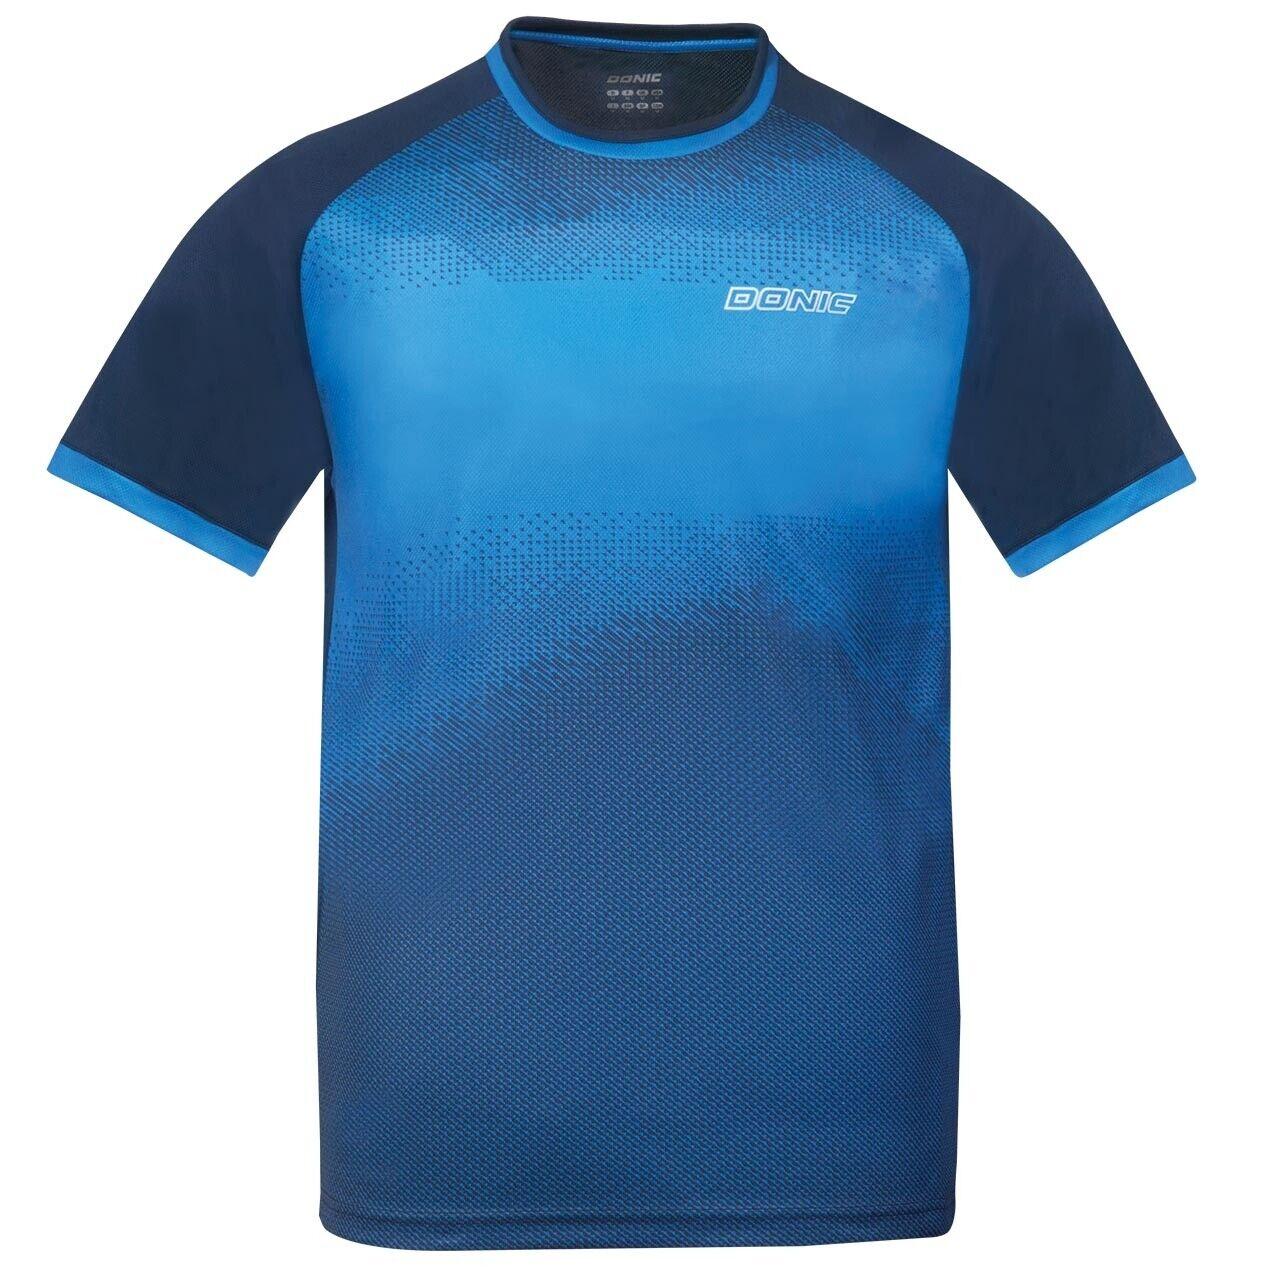 Donic Tee-Shirt Agile blue Respirant Maillot Tennis de Table Badminton Tee-Shirt